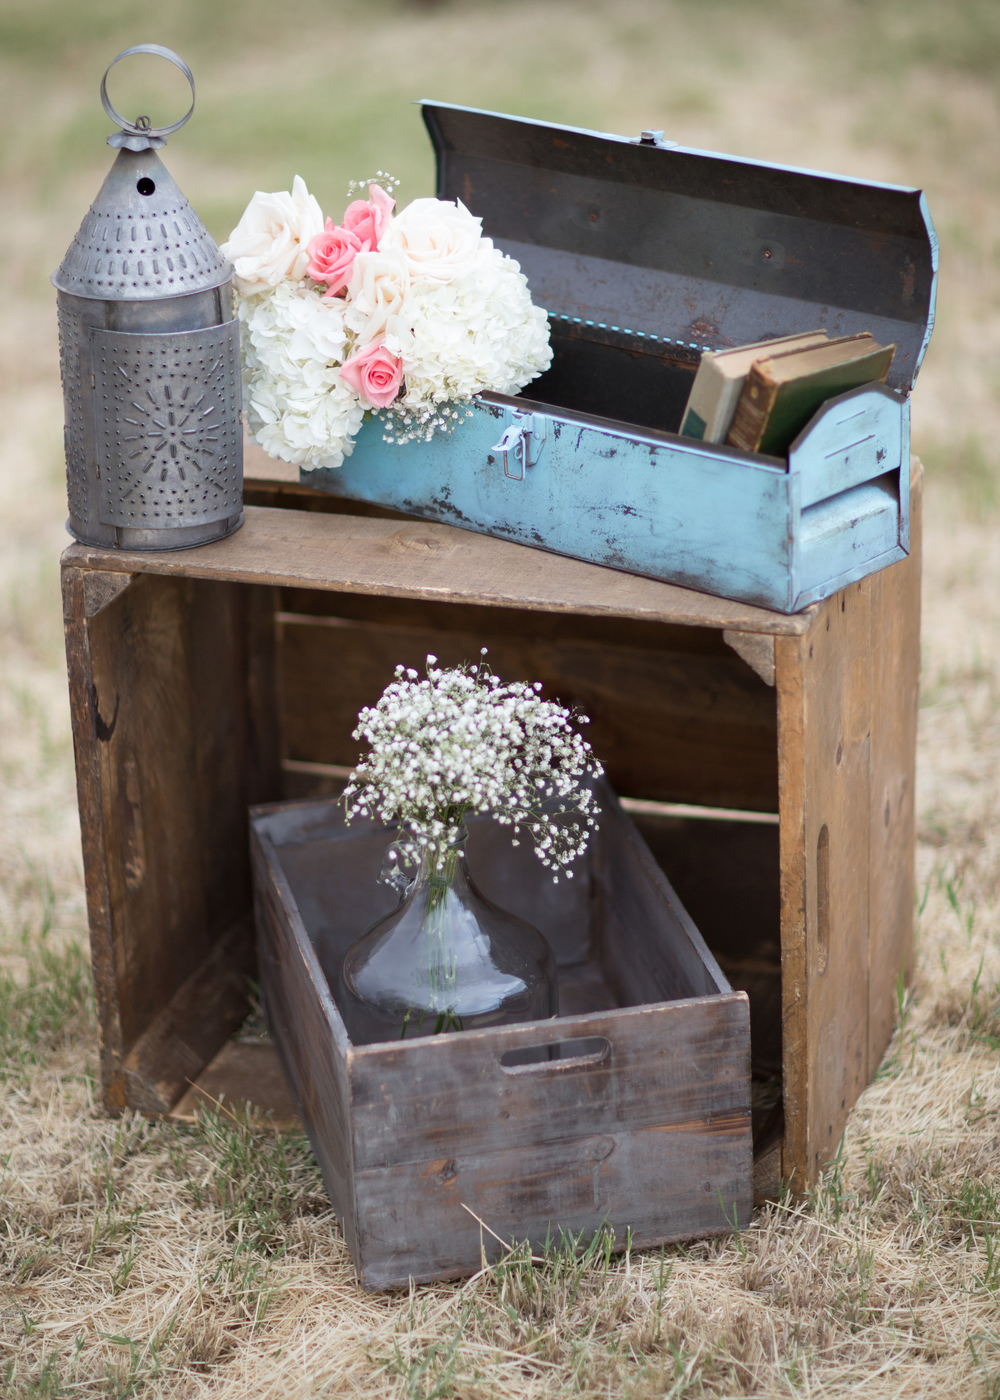 Rustic tool box, Crates, rustic lantern